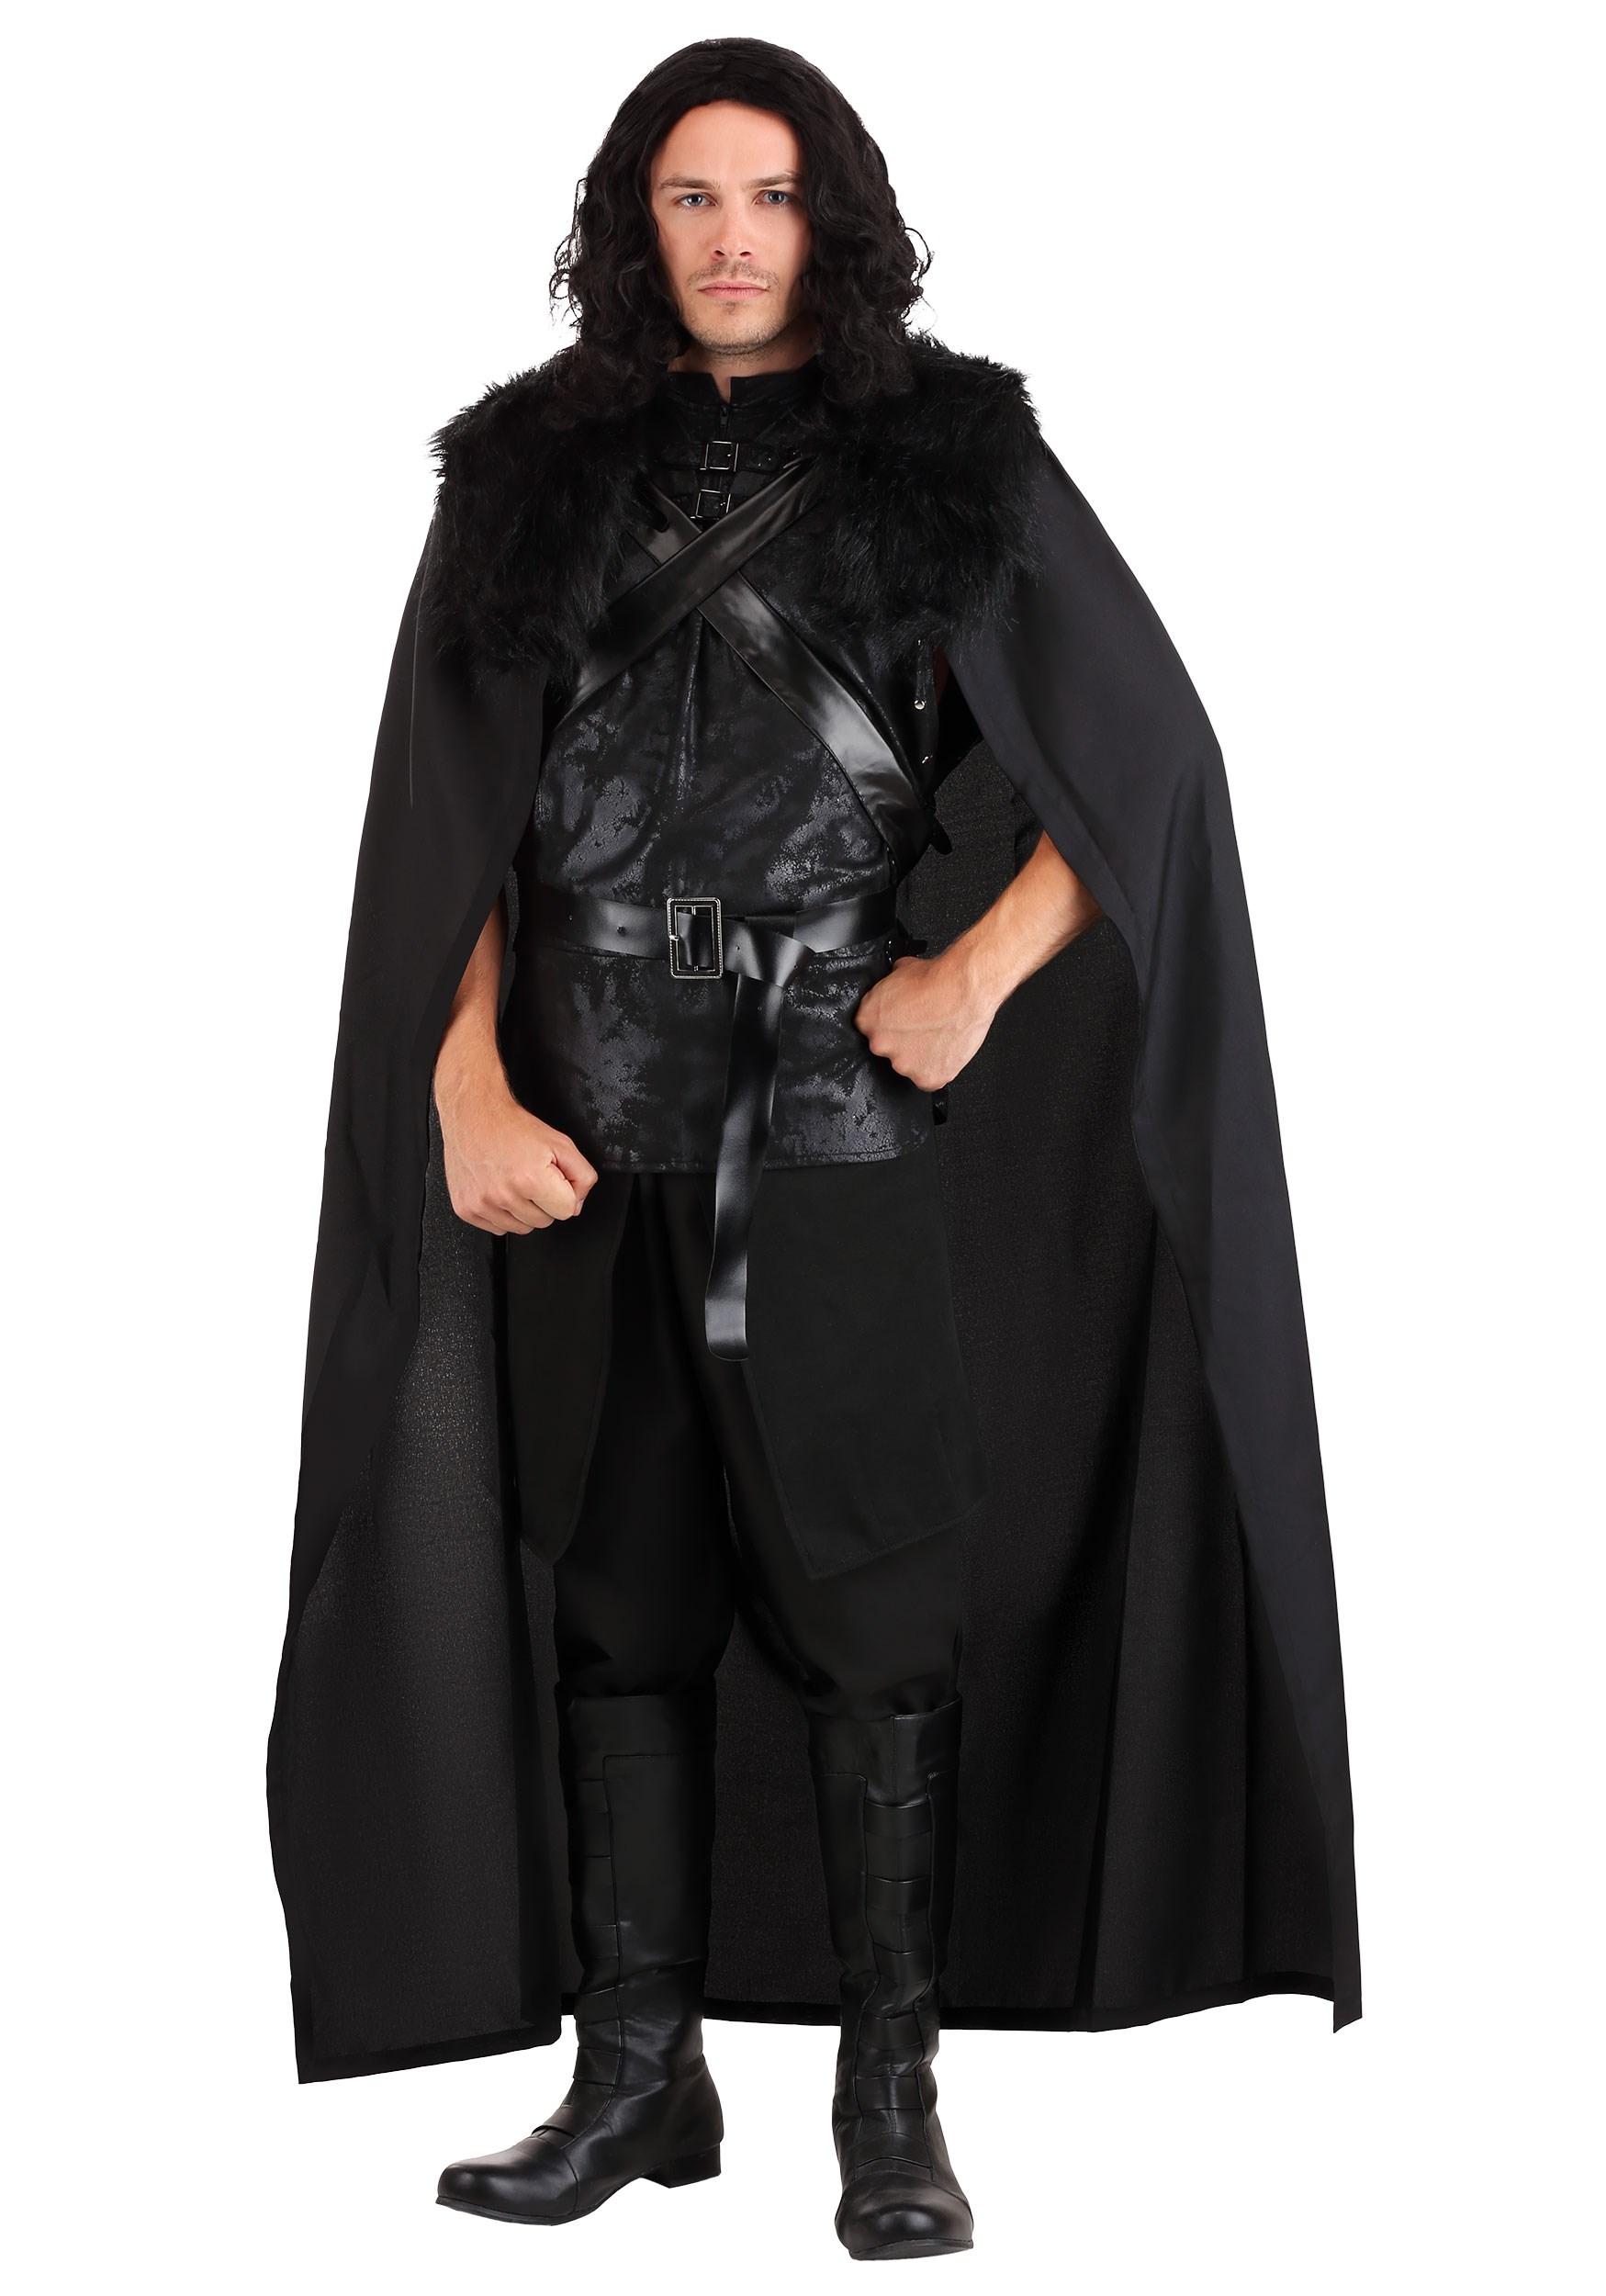 Wall Warrior Costume For Men